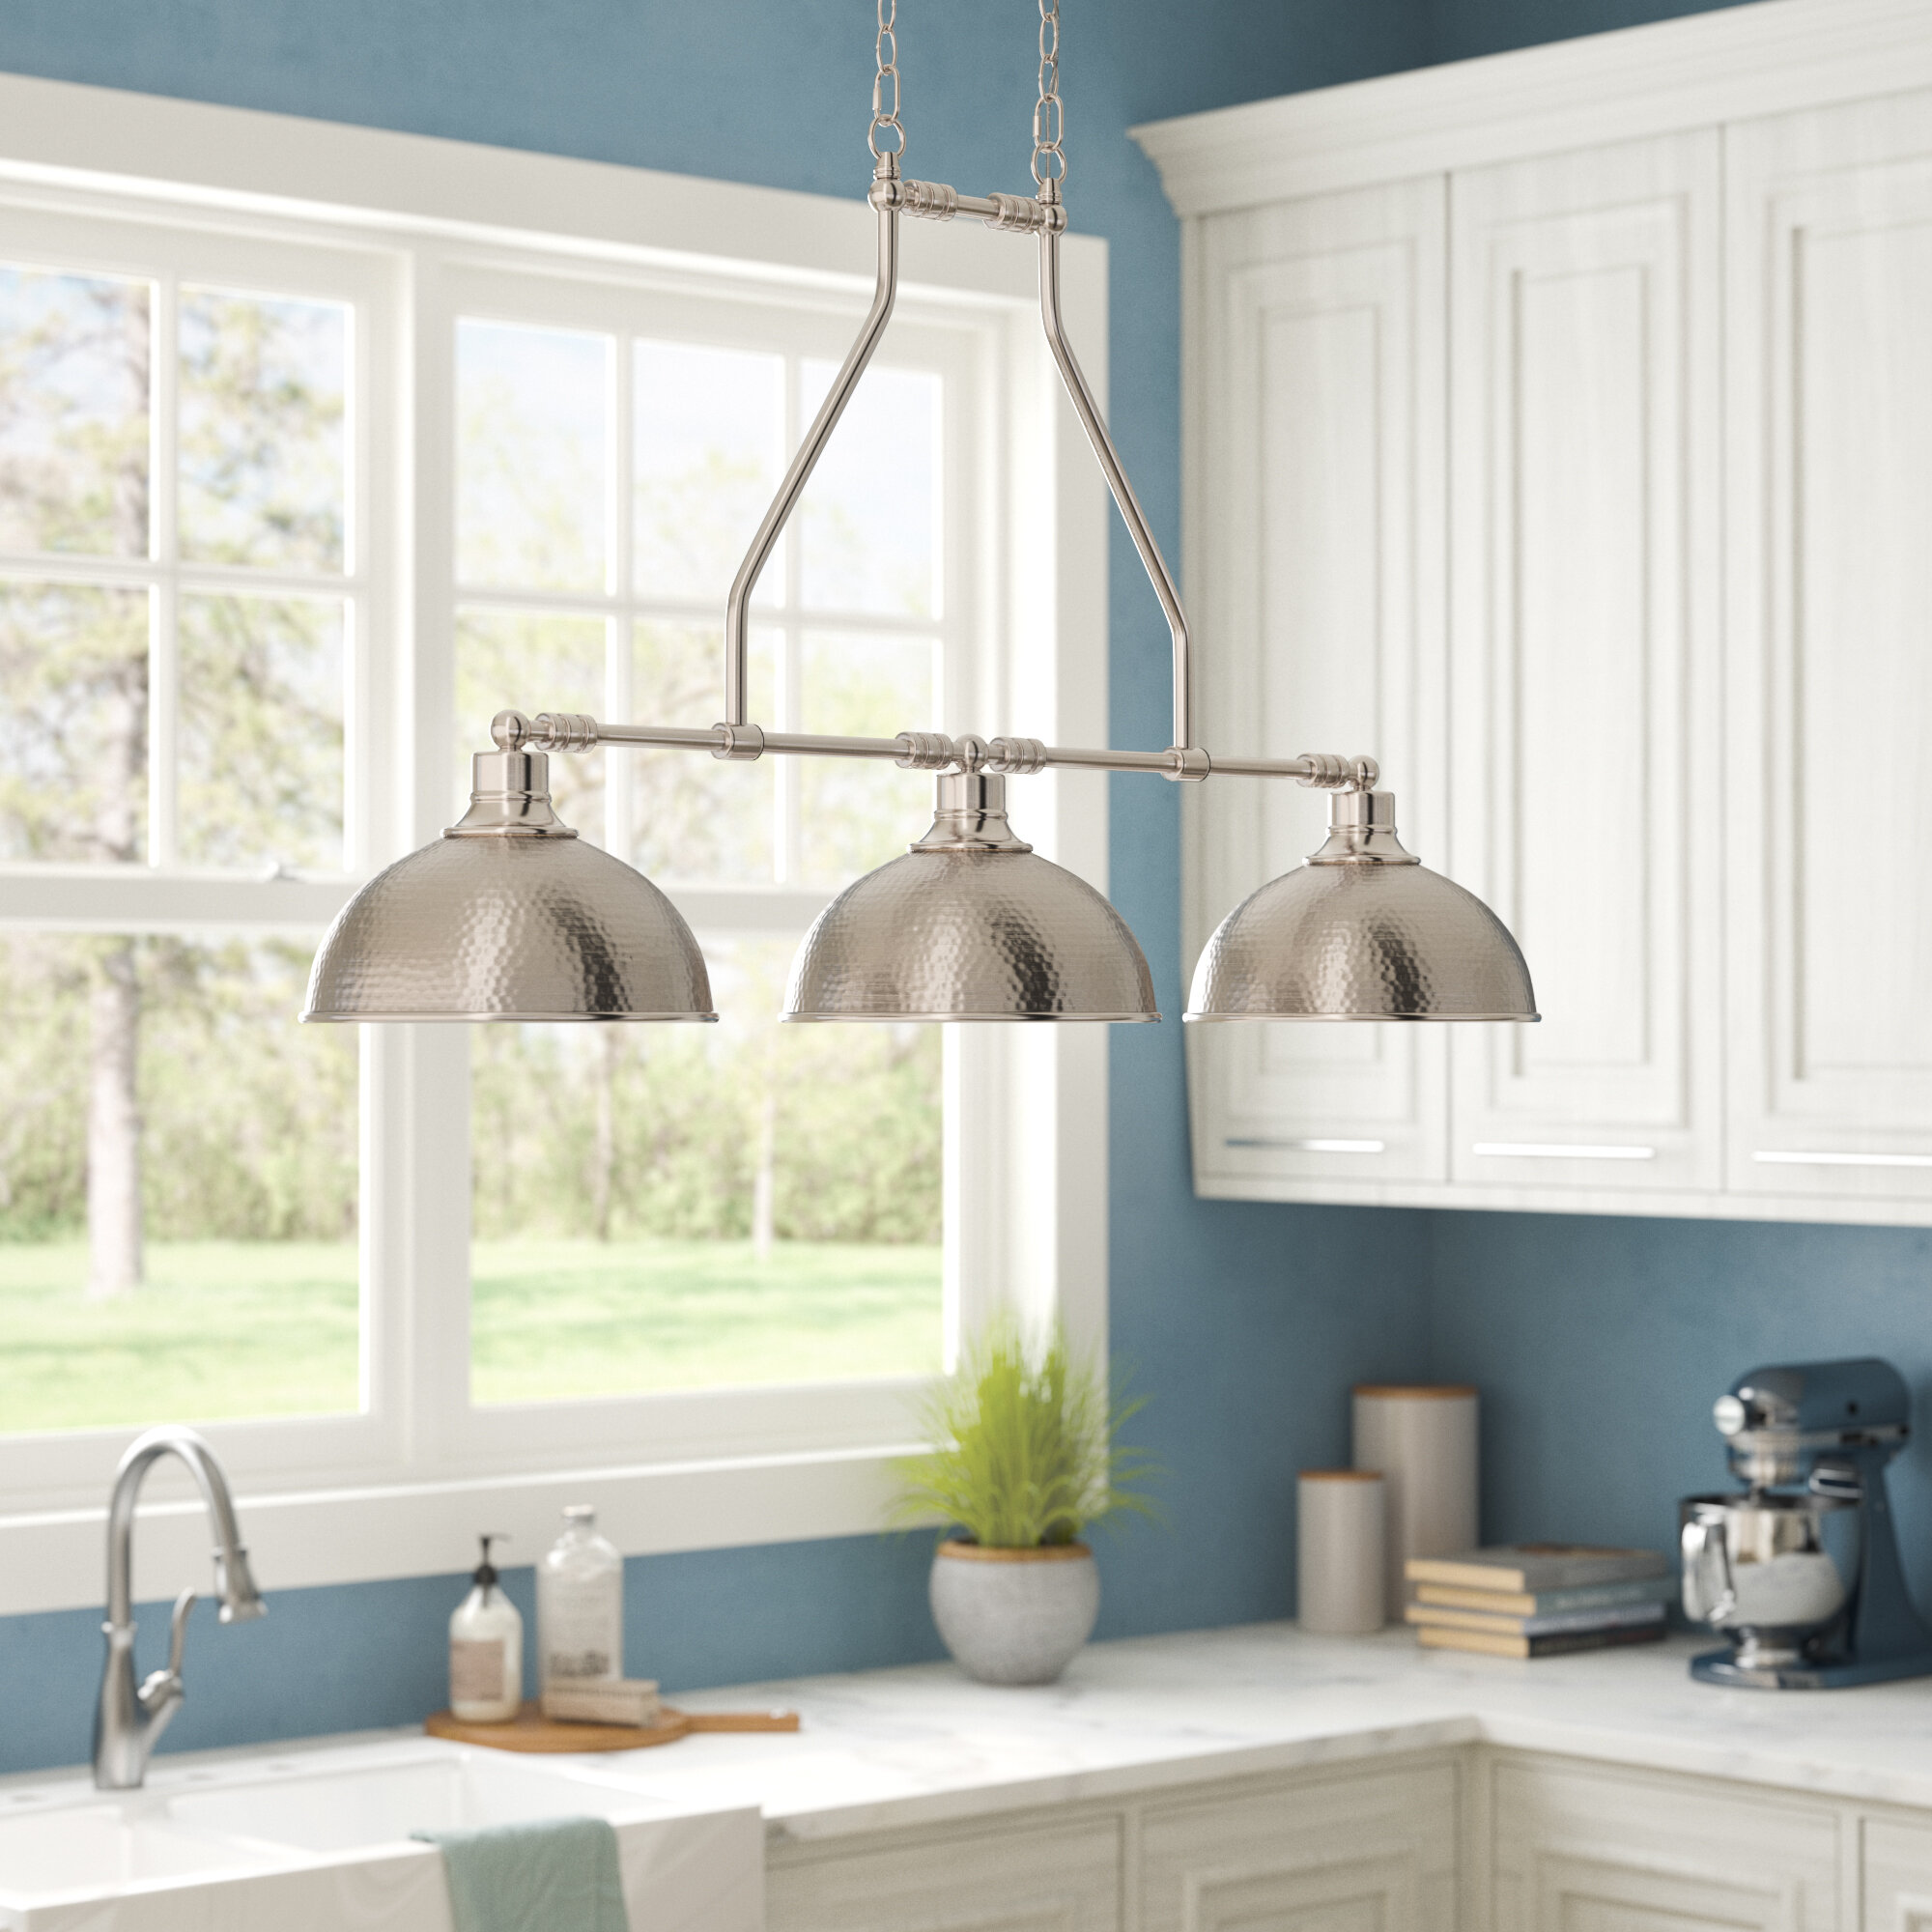 Beachcrest Home Bridgepointe 3 Light Kitchen Island Linear Pendant Reviews Wayfair